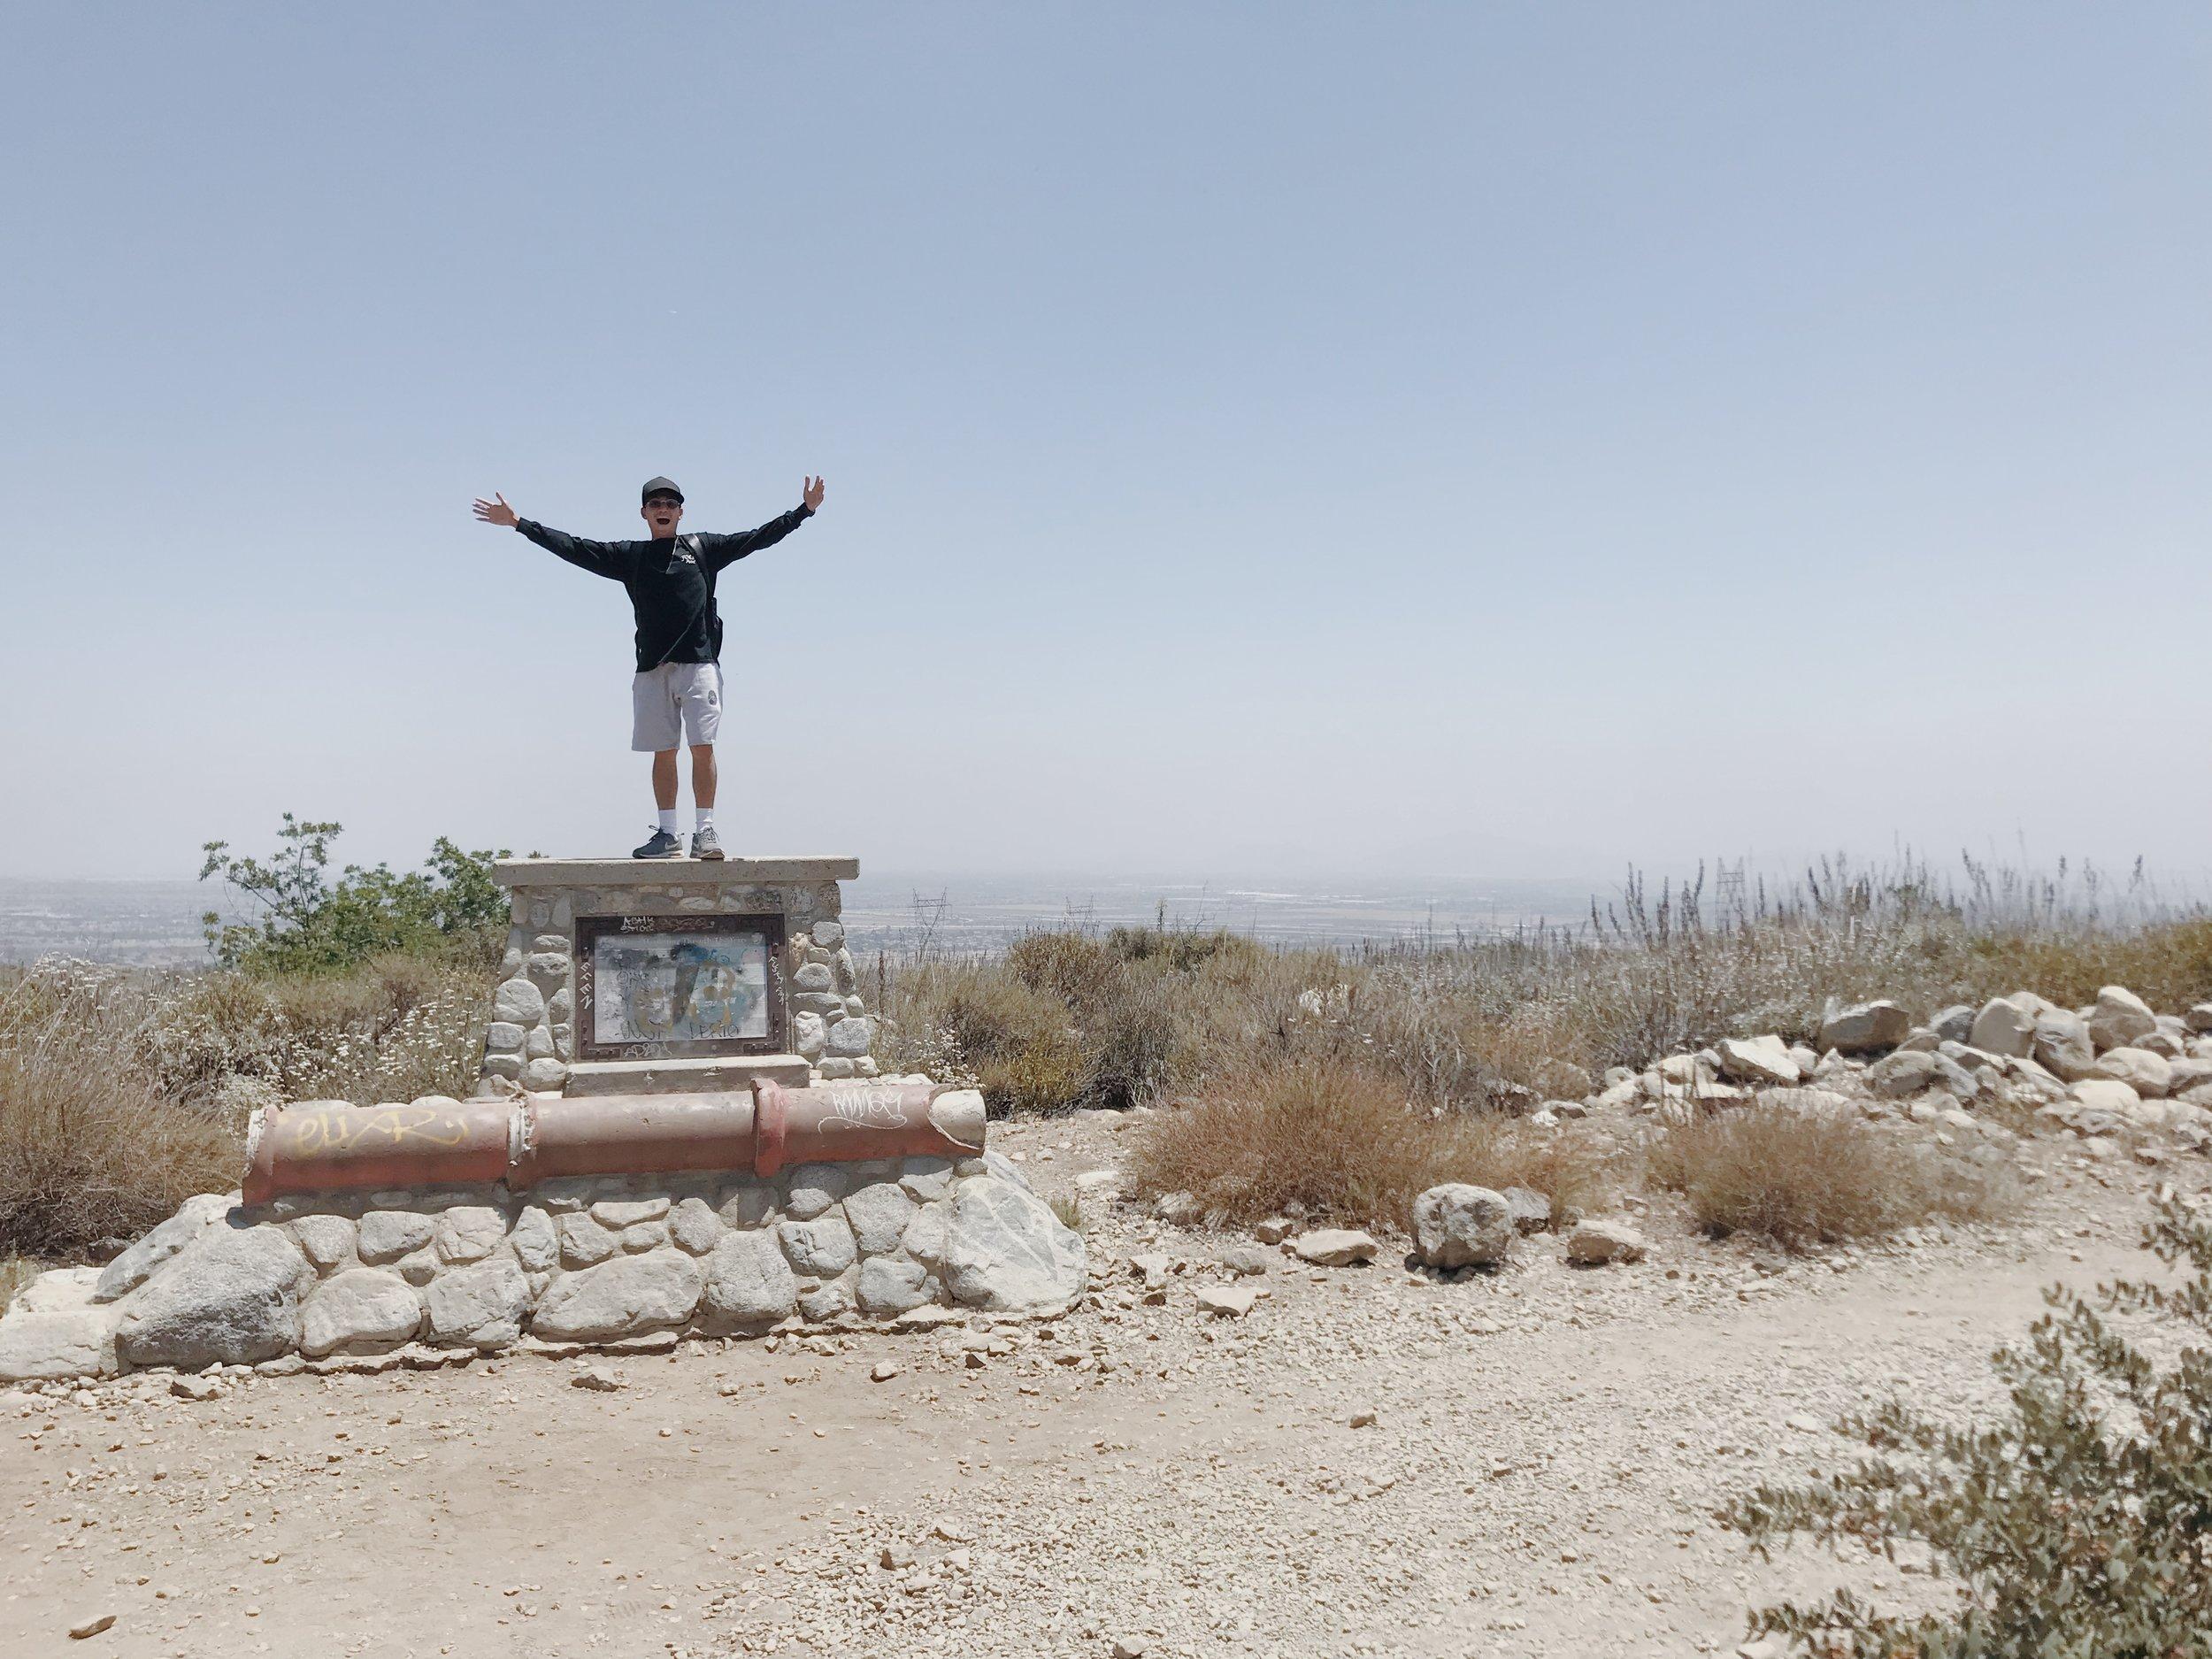 LOCATION: Rancho Cucamonga, CA